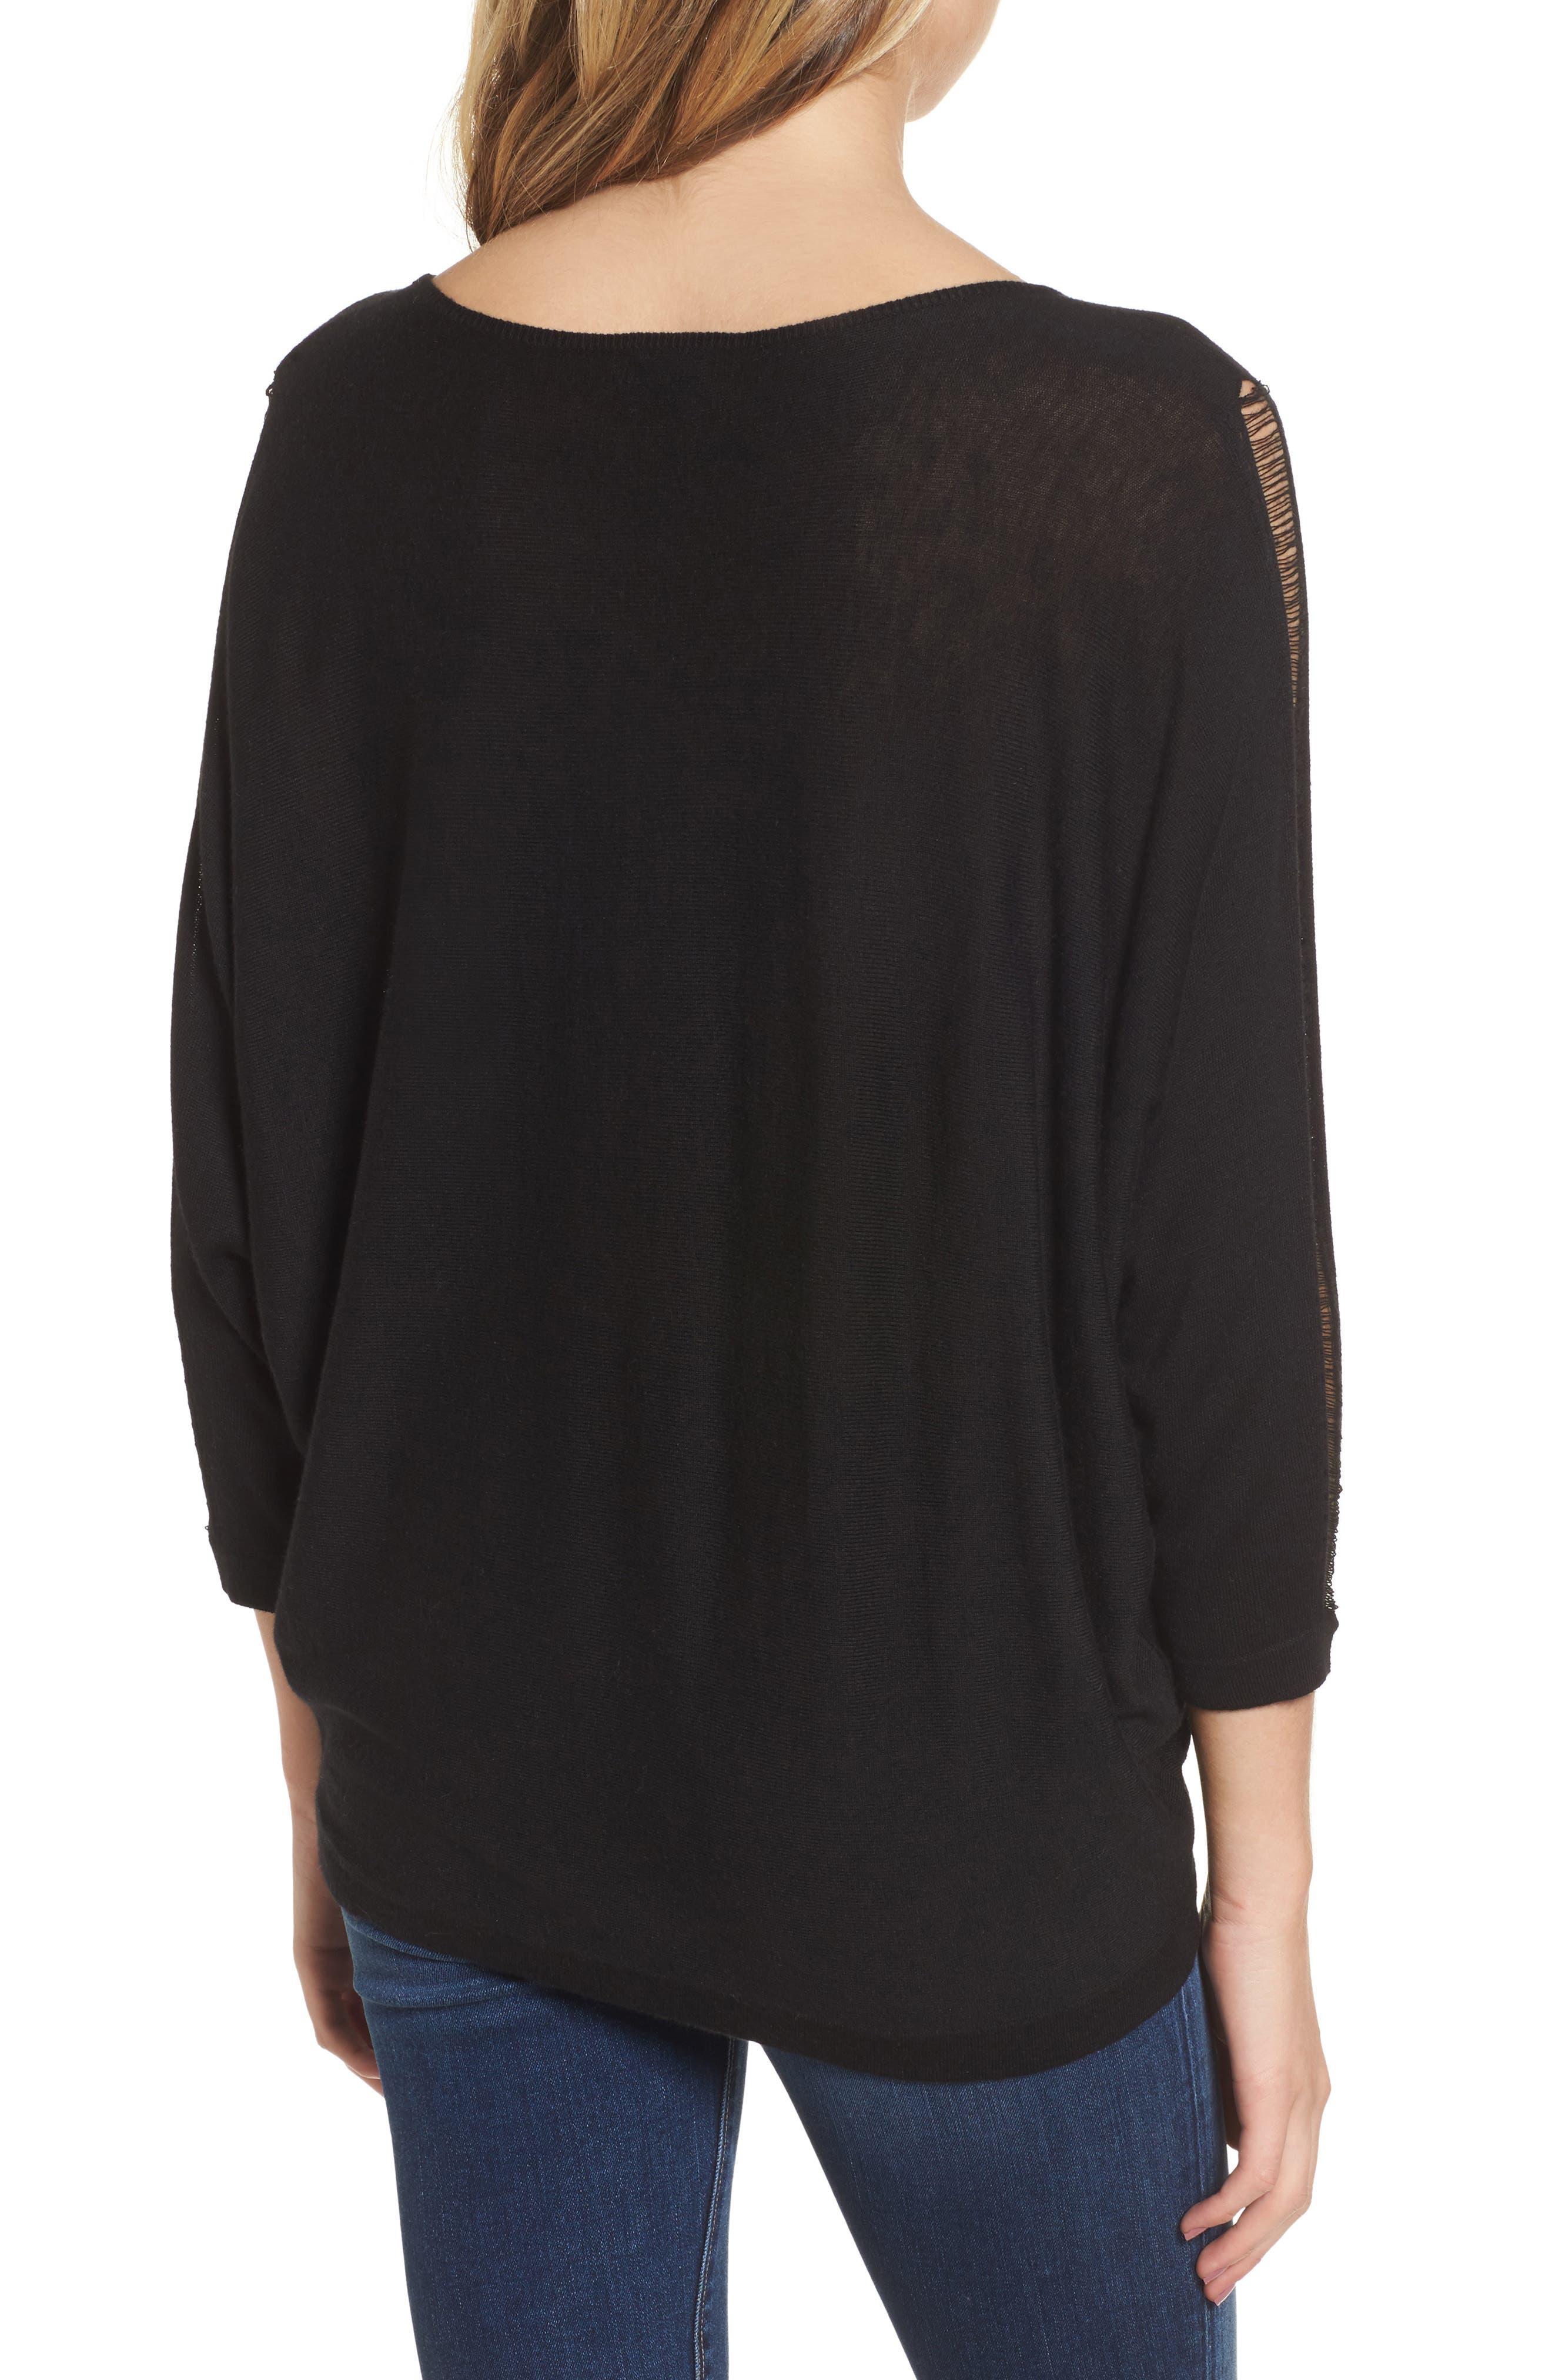 Whitlock Sweater,                             Alternate thumbnail 2, color,                             Black